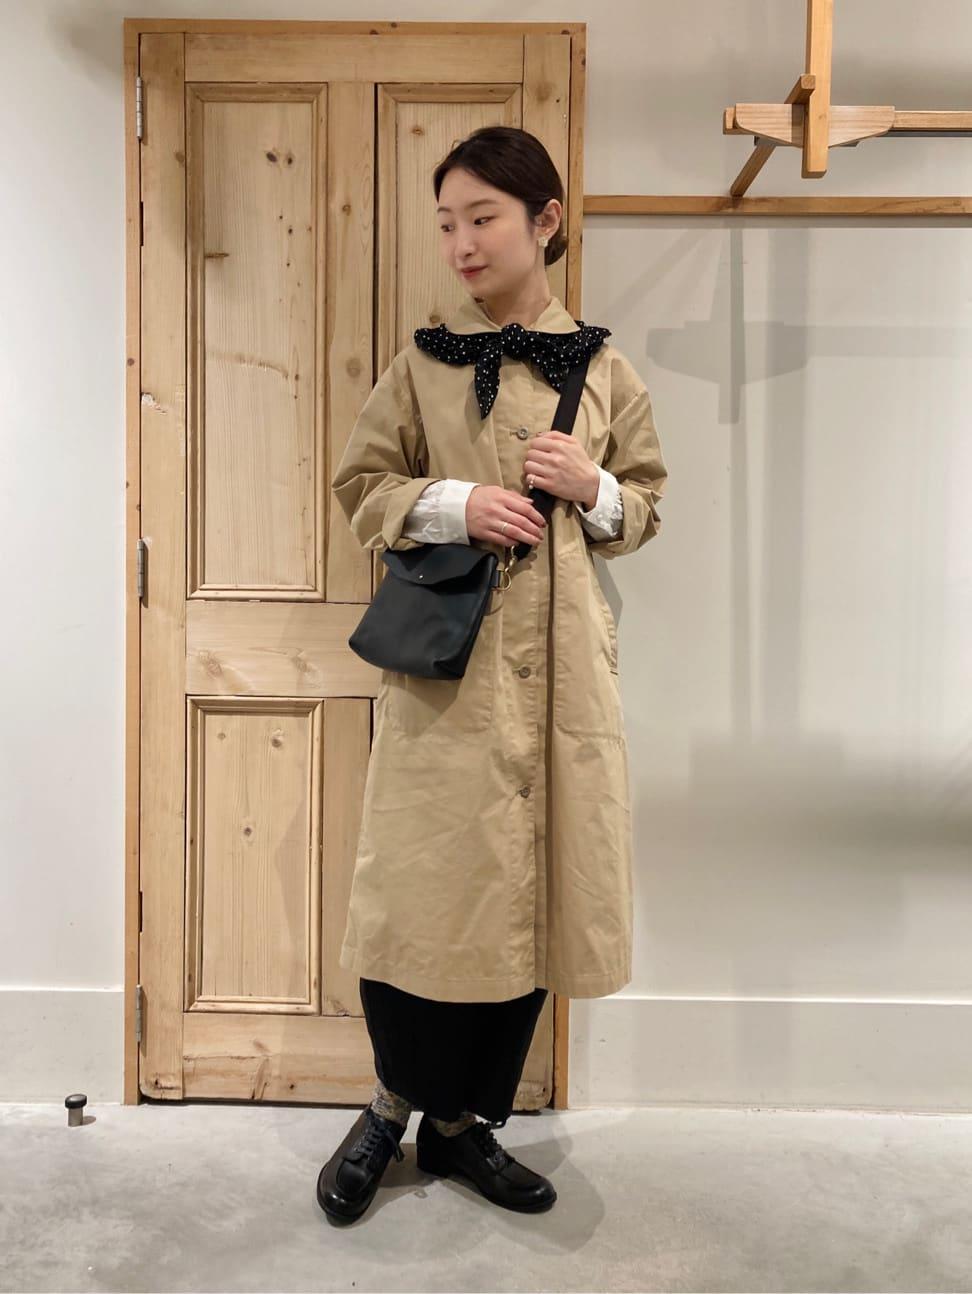 Malle chambre de charme 調布パルコ 身長:162cm 2021.10.05